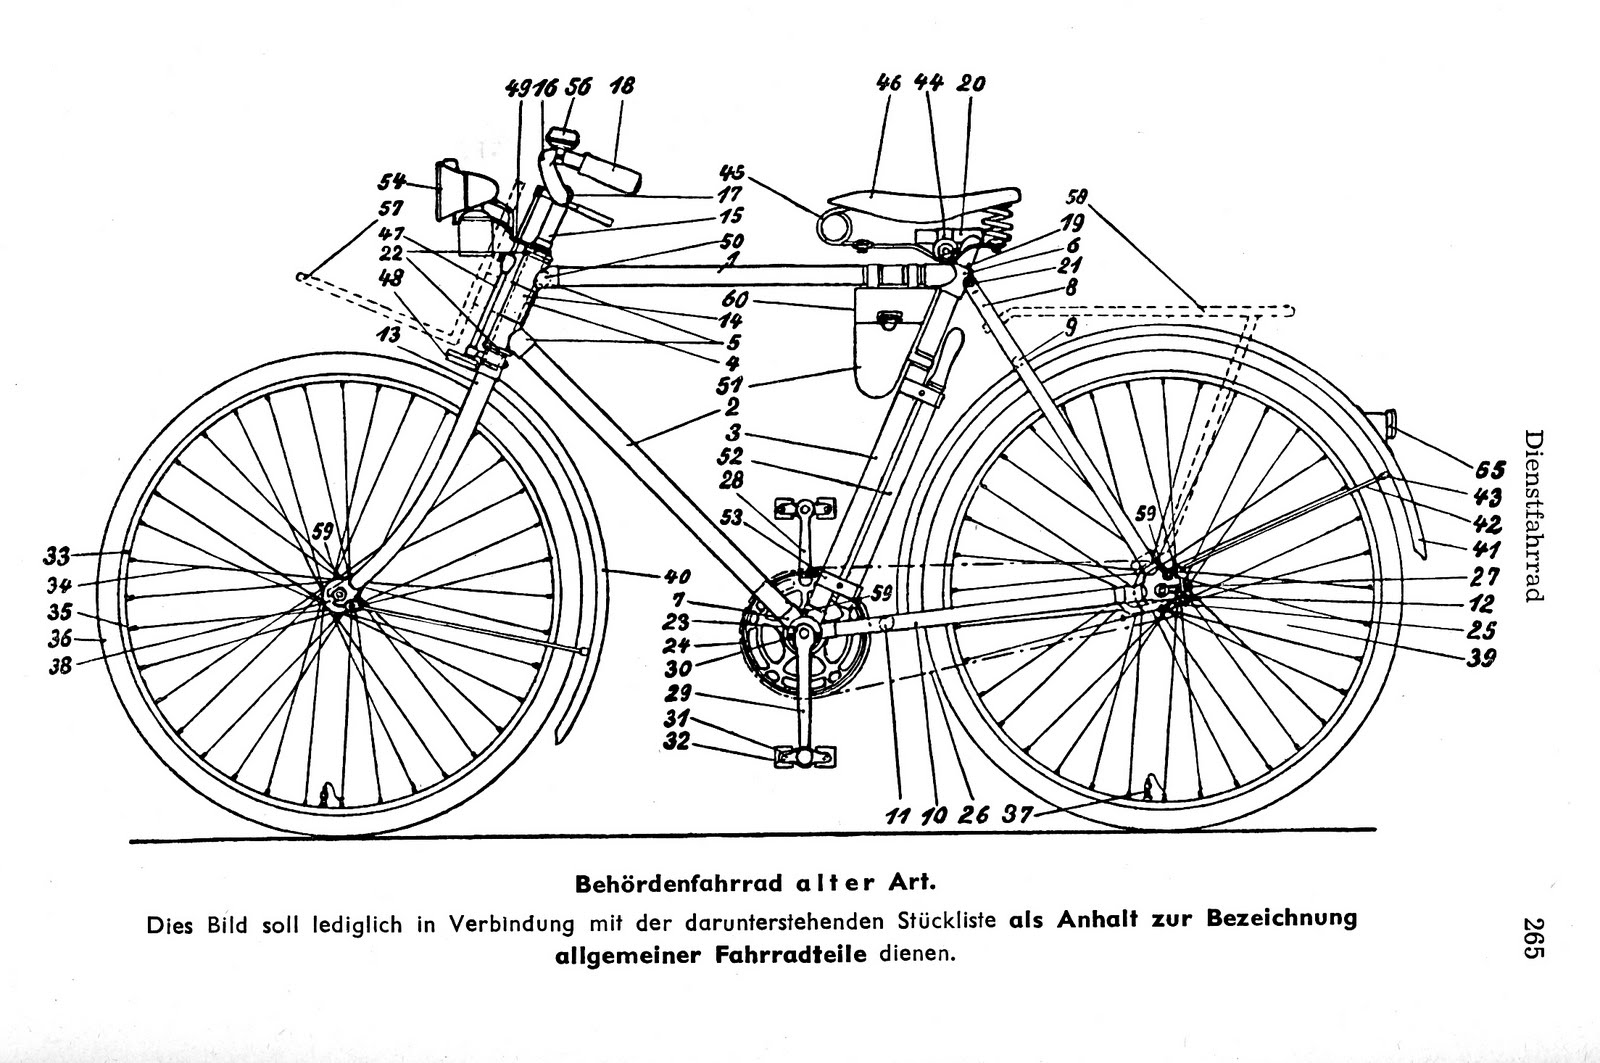 Bike Parts Diagram Mains Powered Smoke Alarm Wiring Four Bees Vintage Dienstfahrrad Info